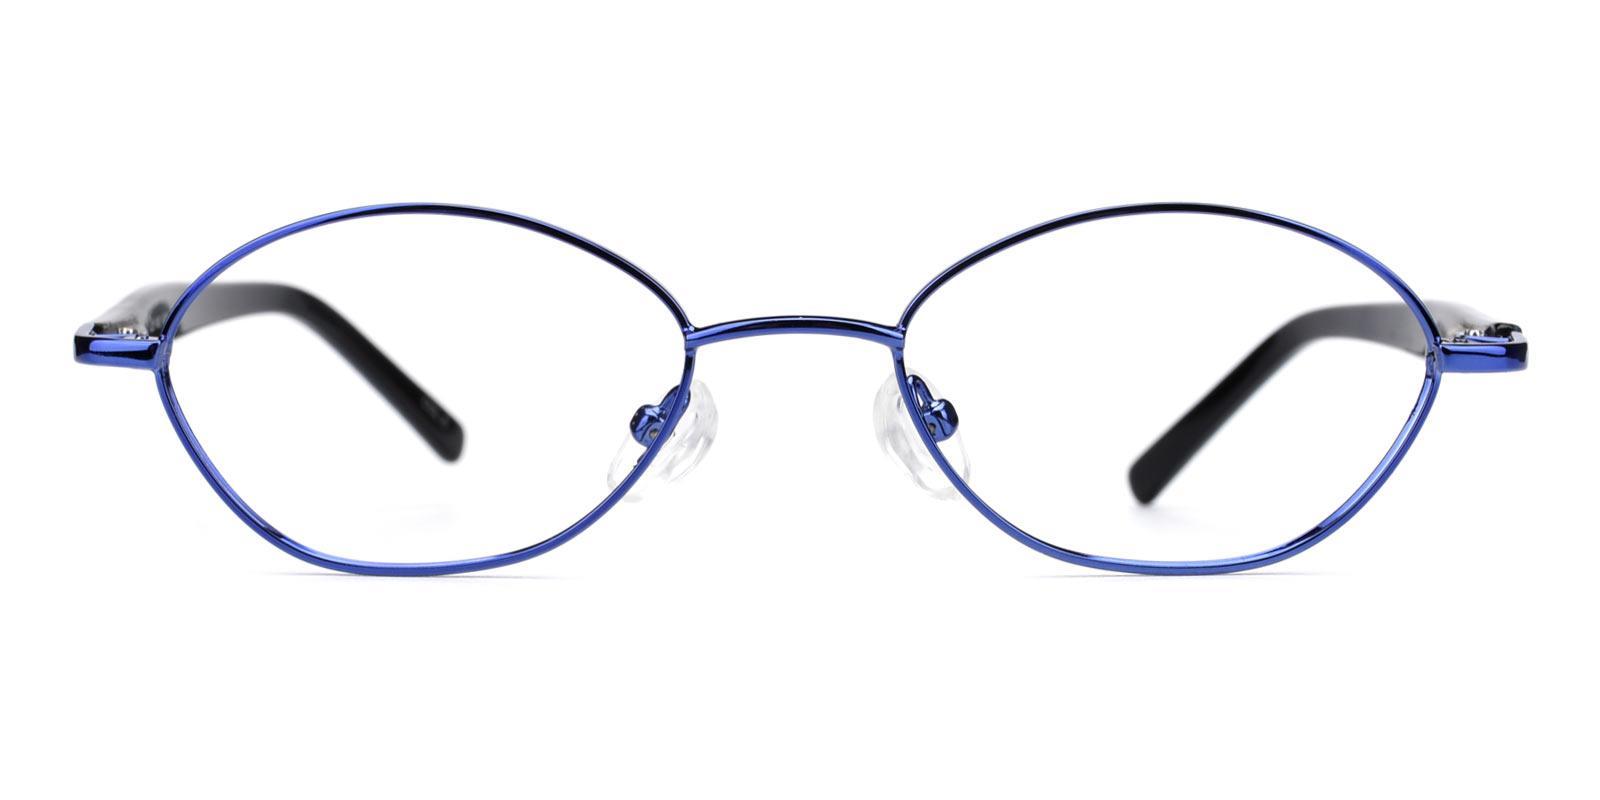 Lollipop-Blue-Oval-Metal-Eyeglasses-detail